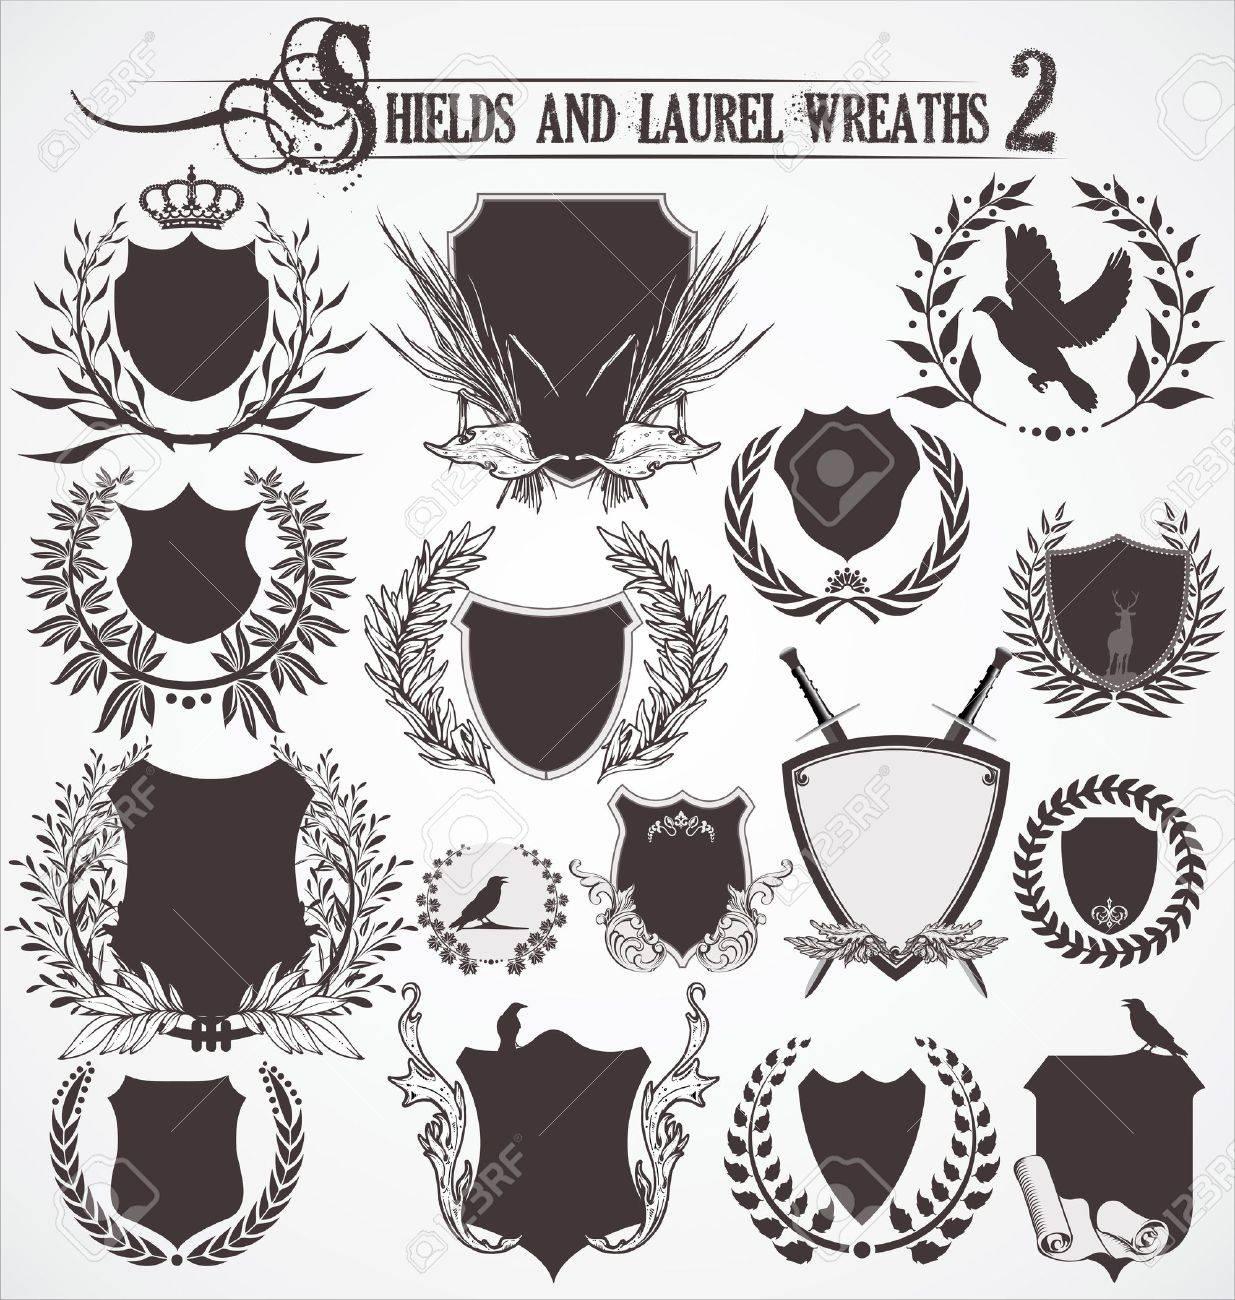 Shields And Laurel Wreaths - set 2 - 12021819